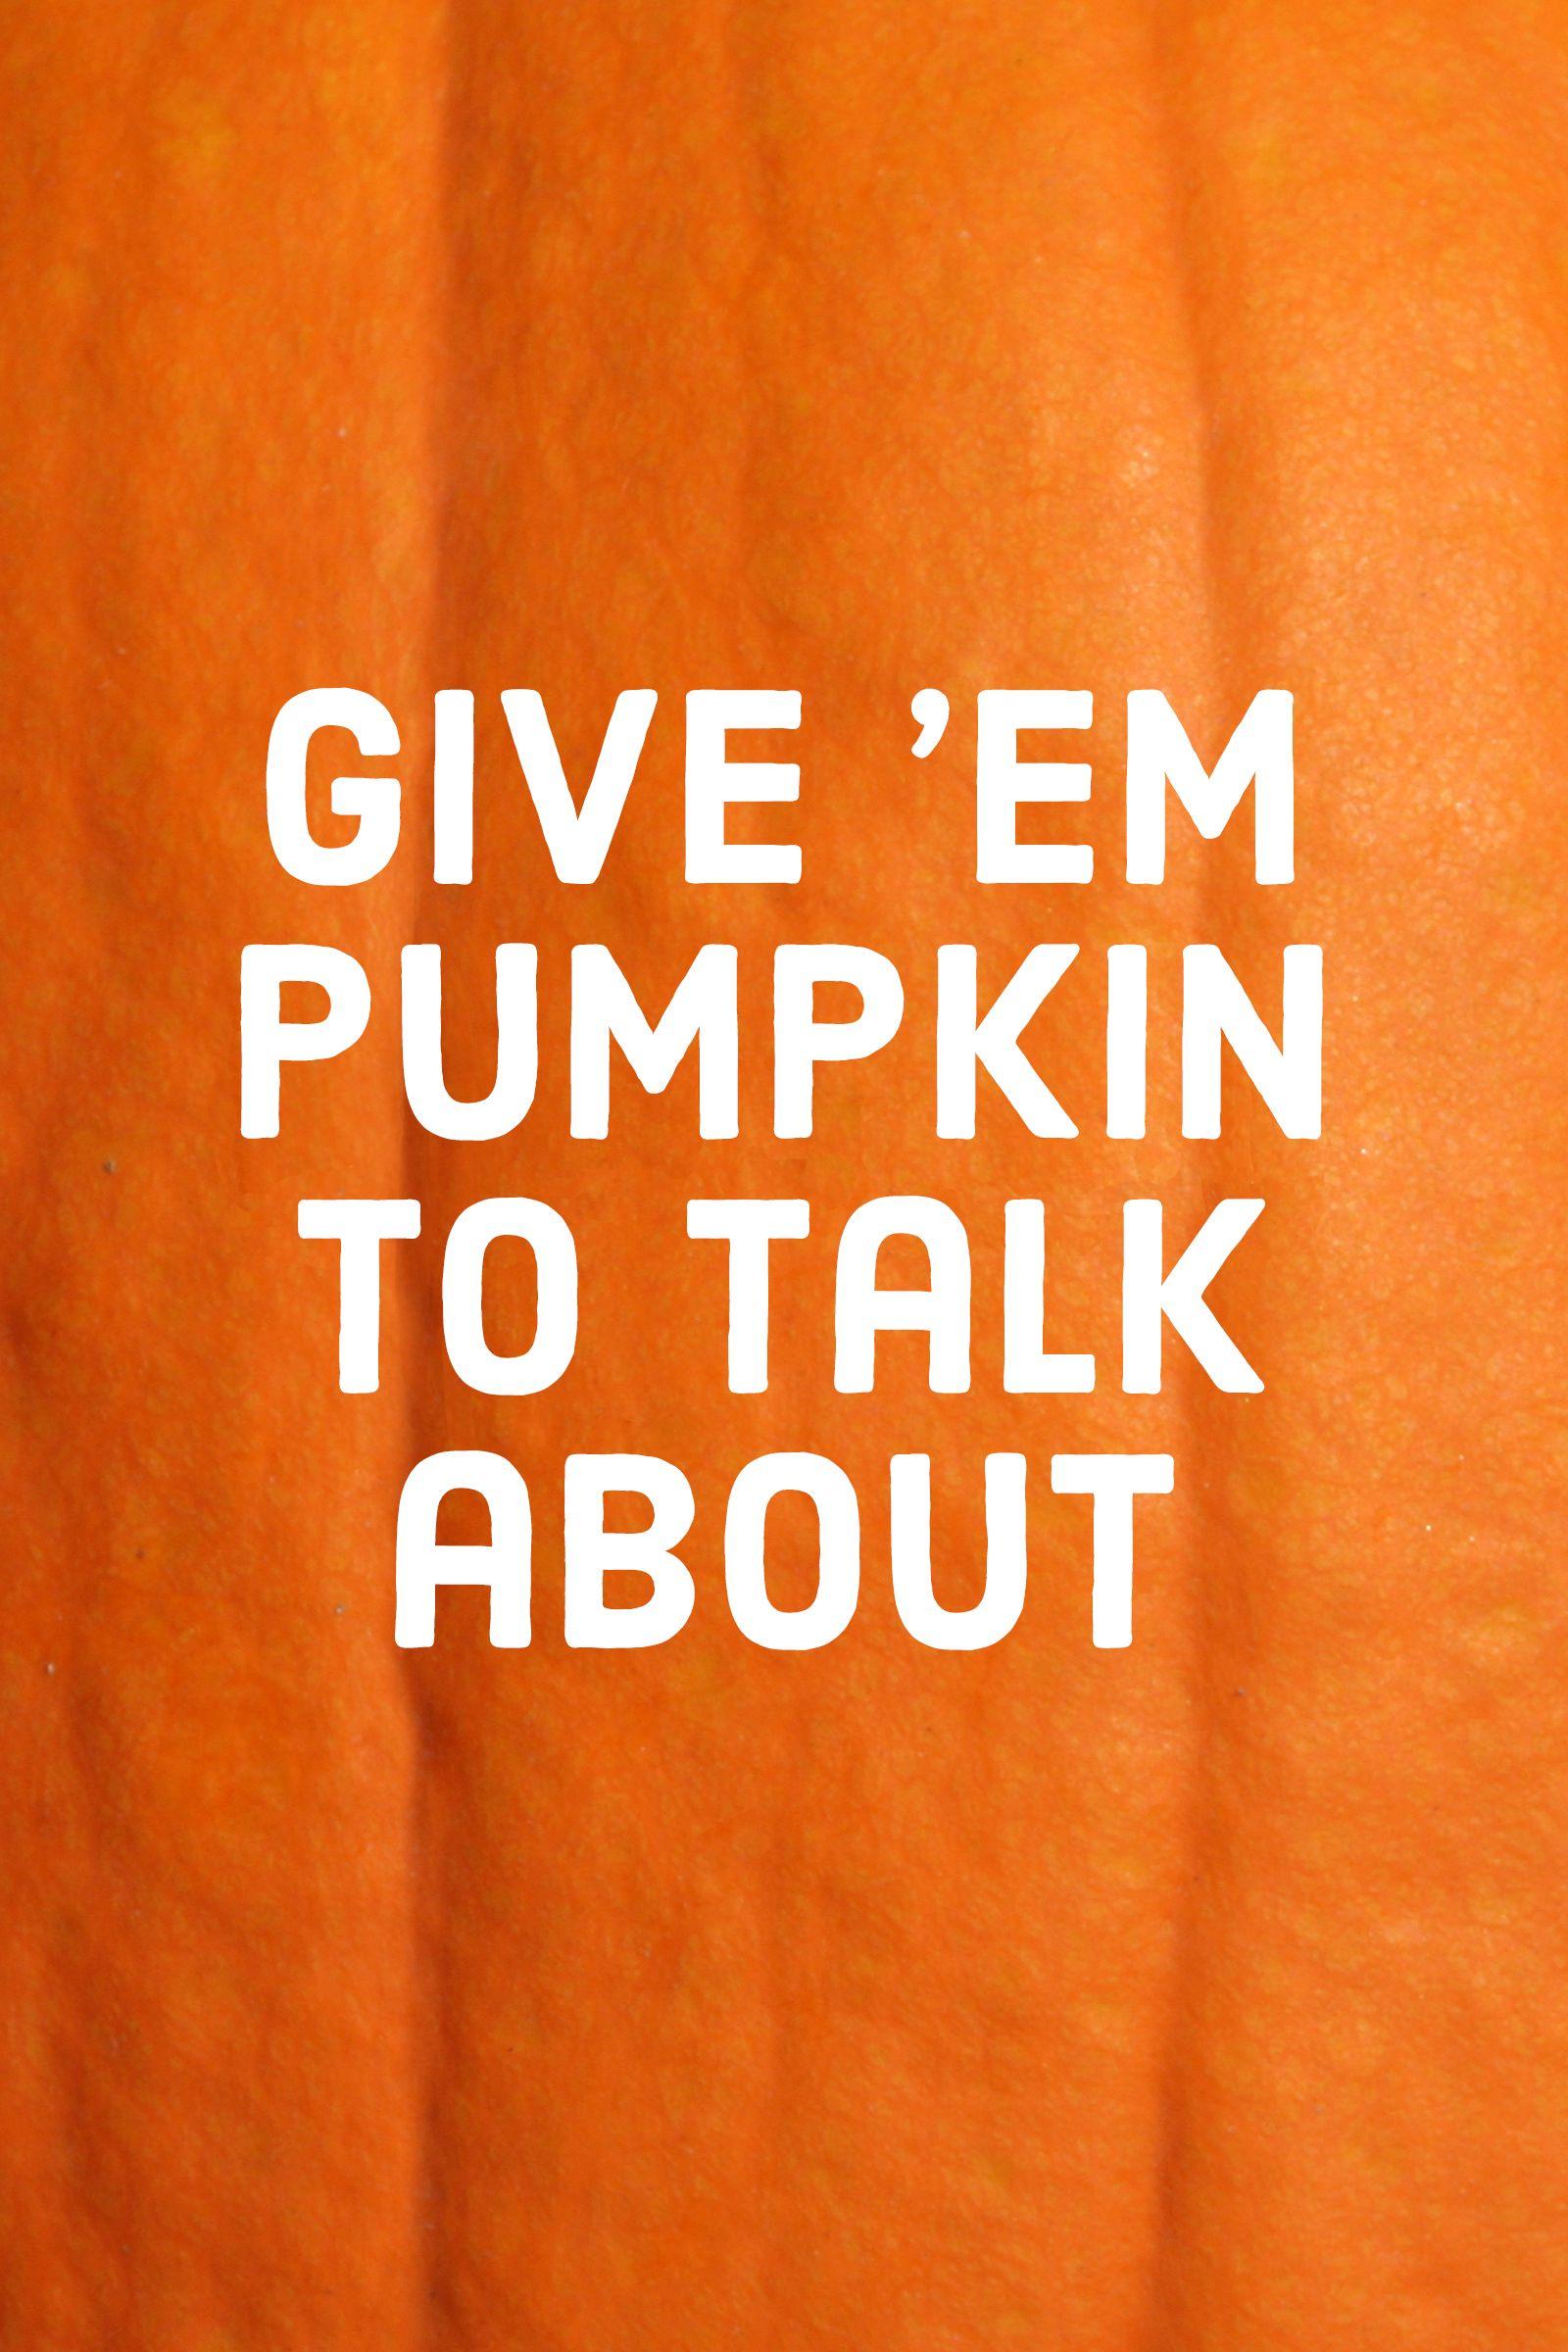 pumpkin quotes andpuns give 'em pumpkin to talk about